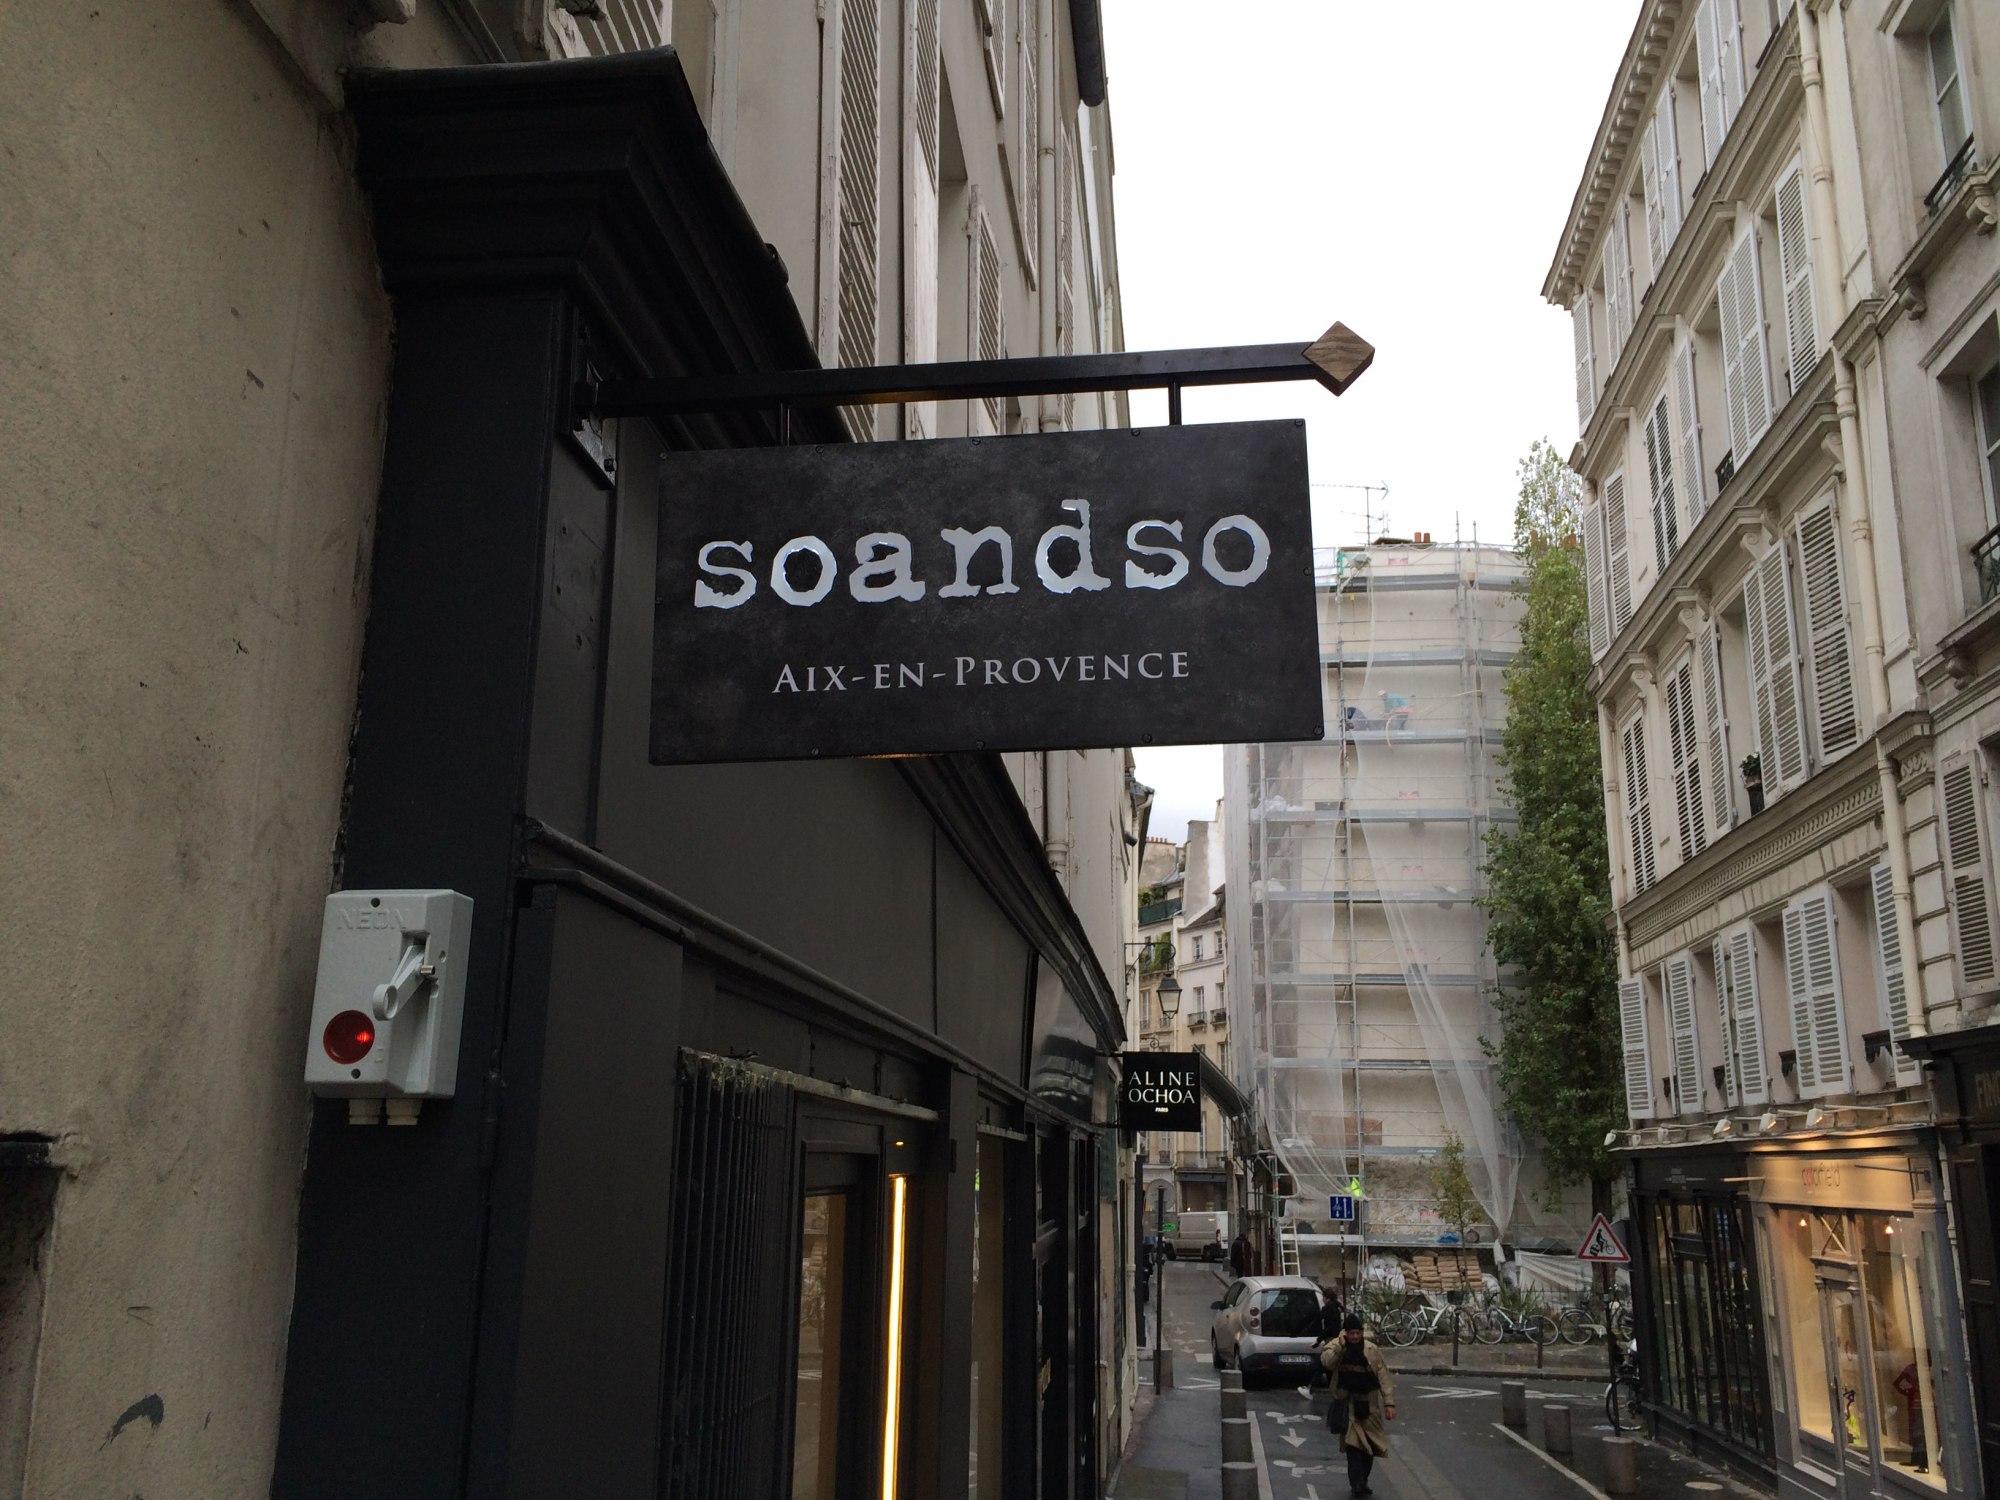 Enseigne So and so PARIS VI